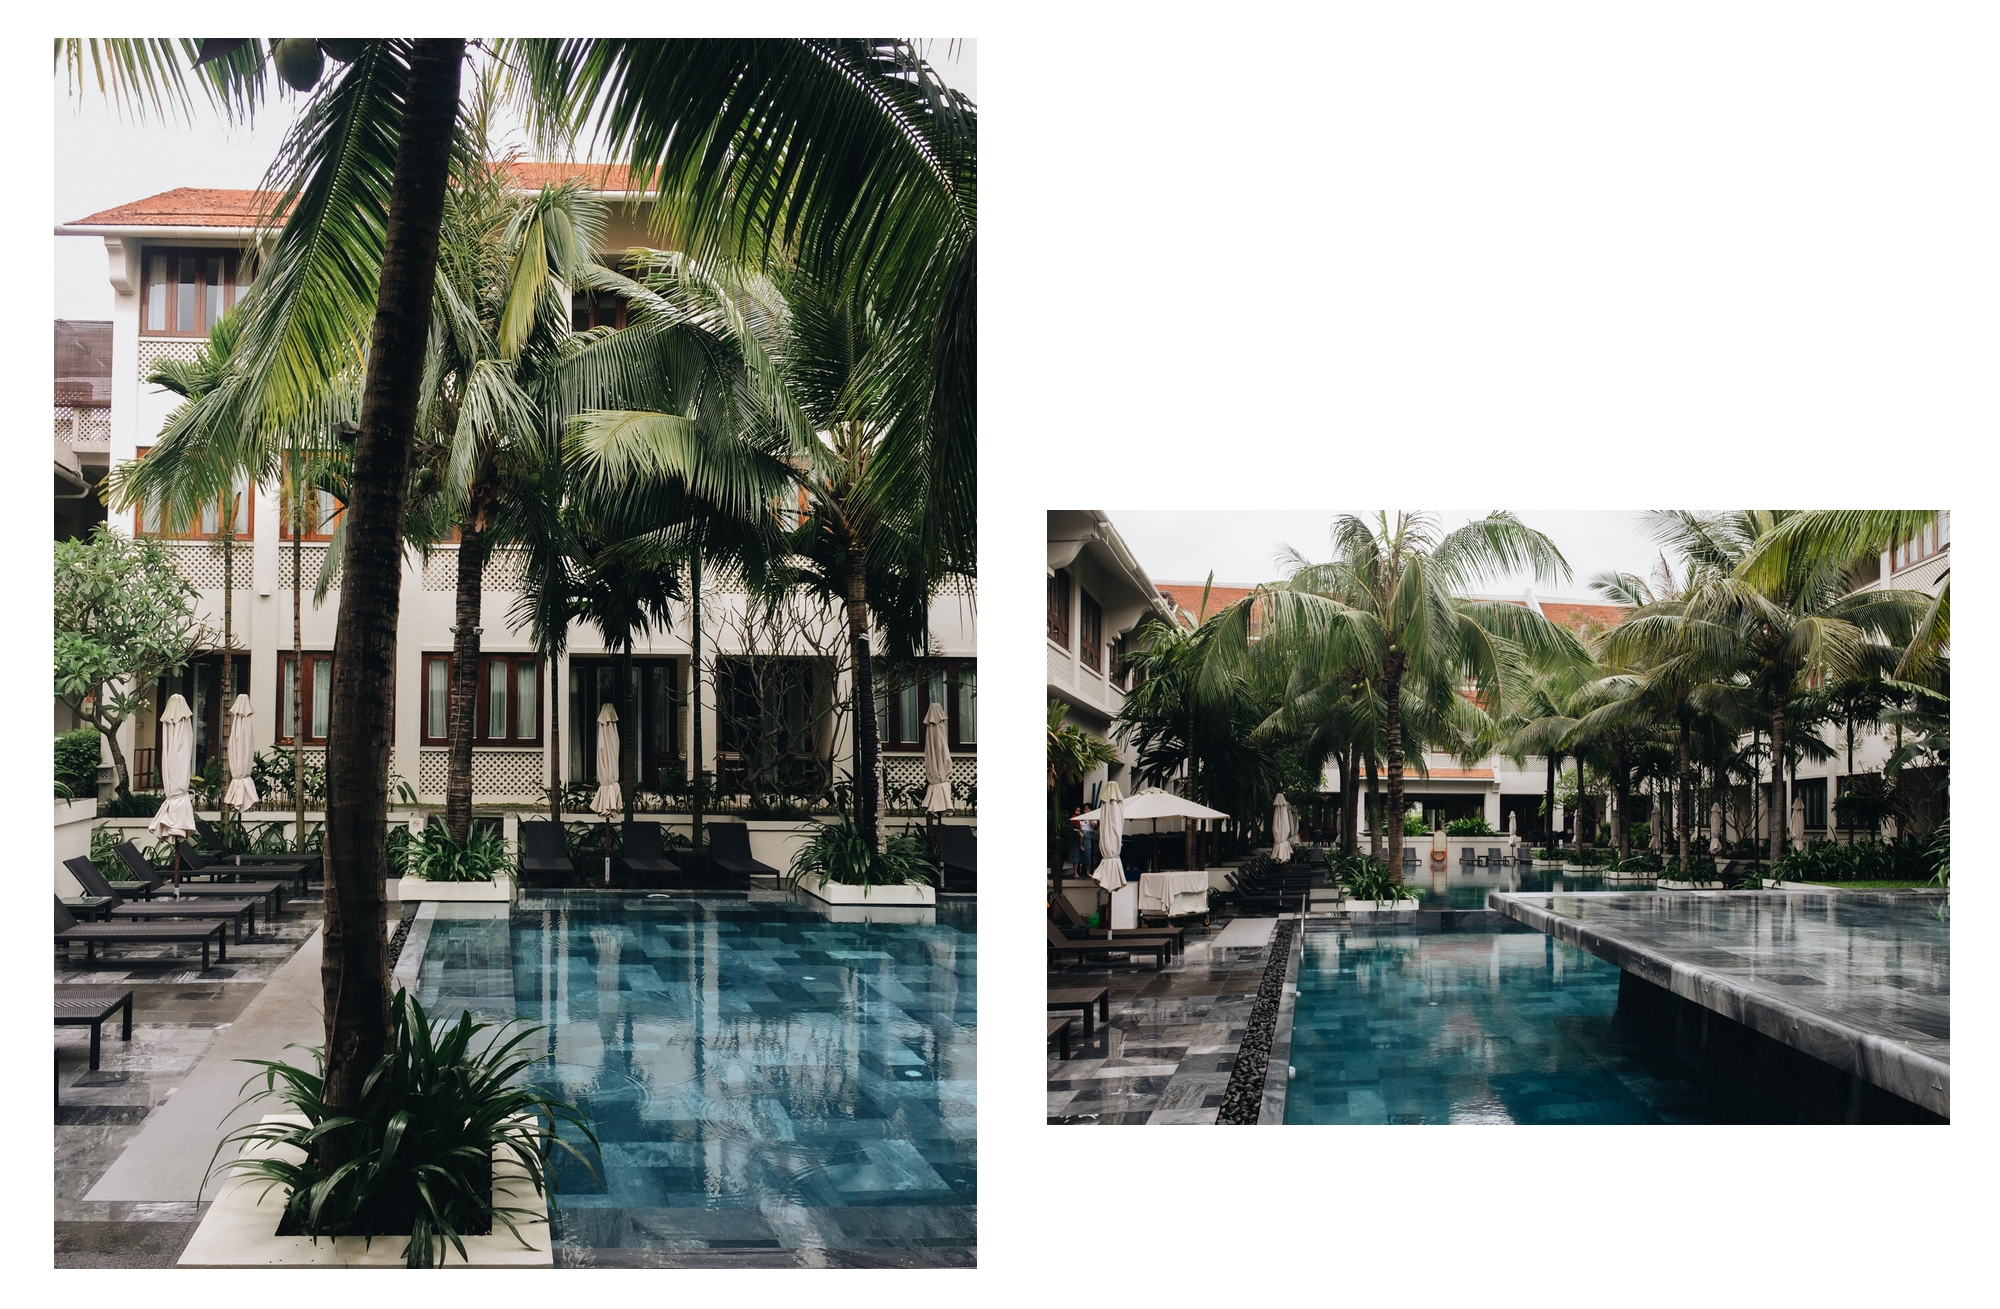 review-hotel-almanity-hoian-blog-voyage-onmywayfr-1.jpg